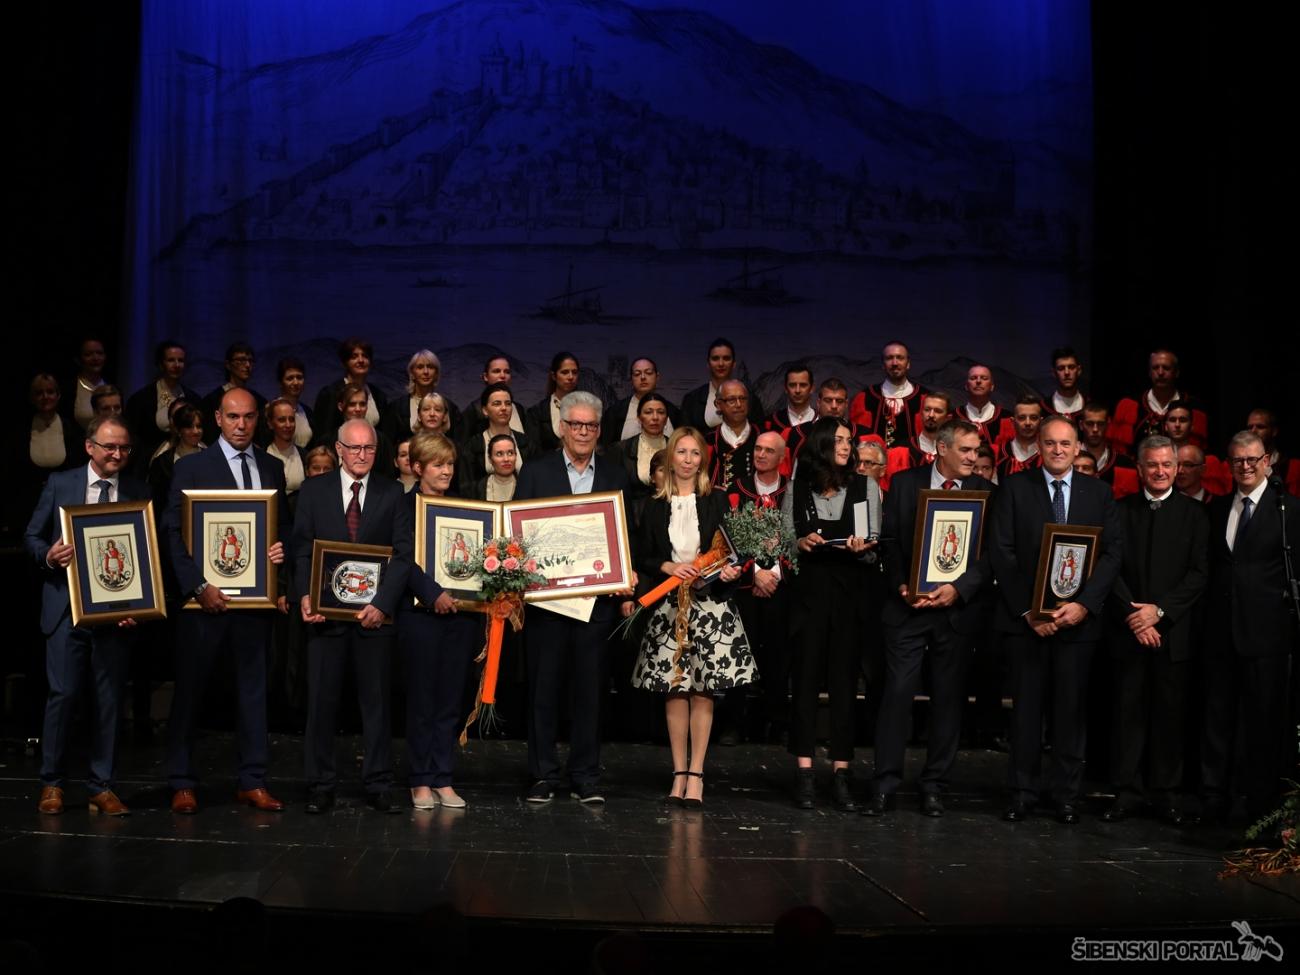 nagrada grada sibenika 280917 15